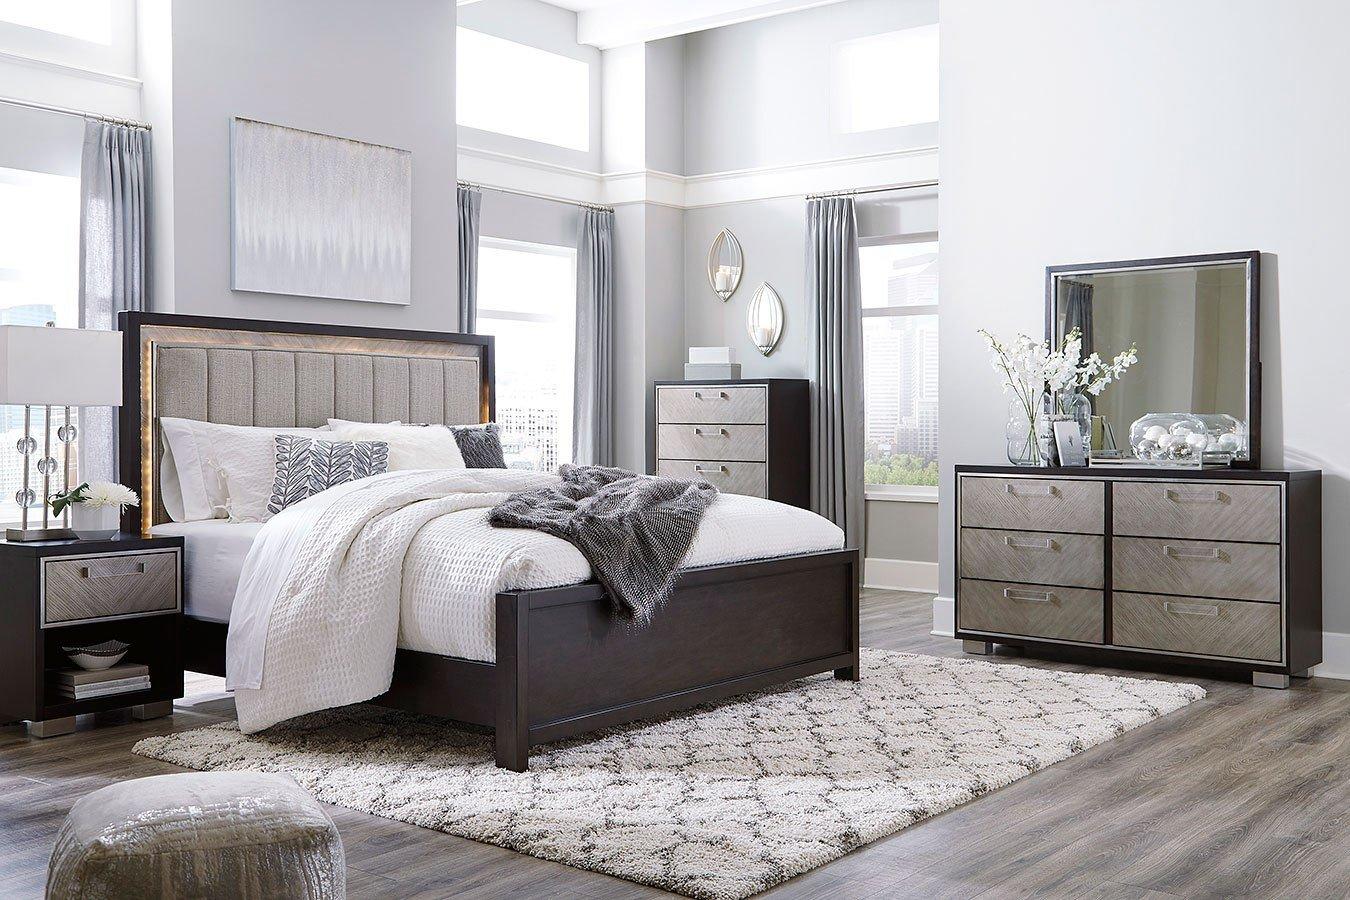 Ashley Furniture Kids Bedroom Beautiful Maretto Panel Bedroom Set